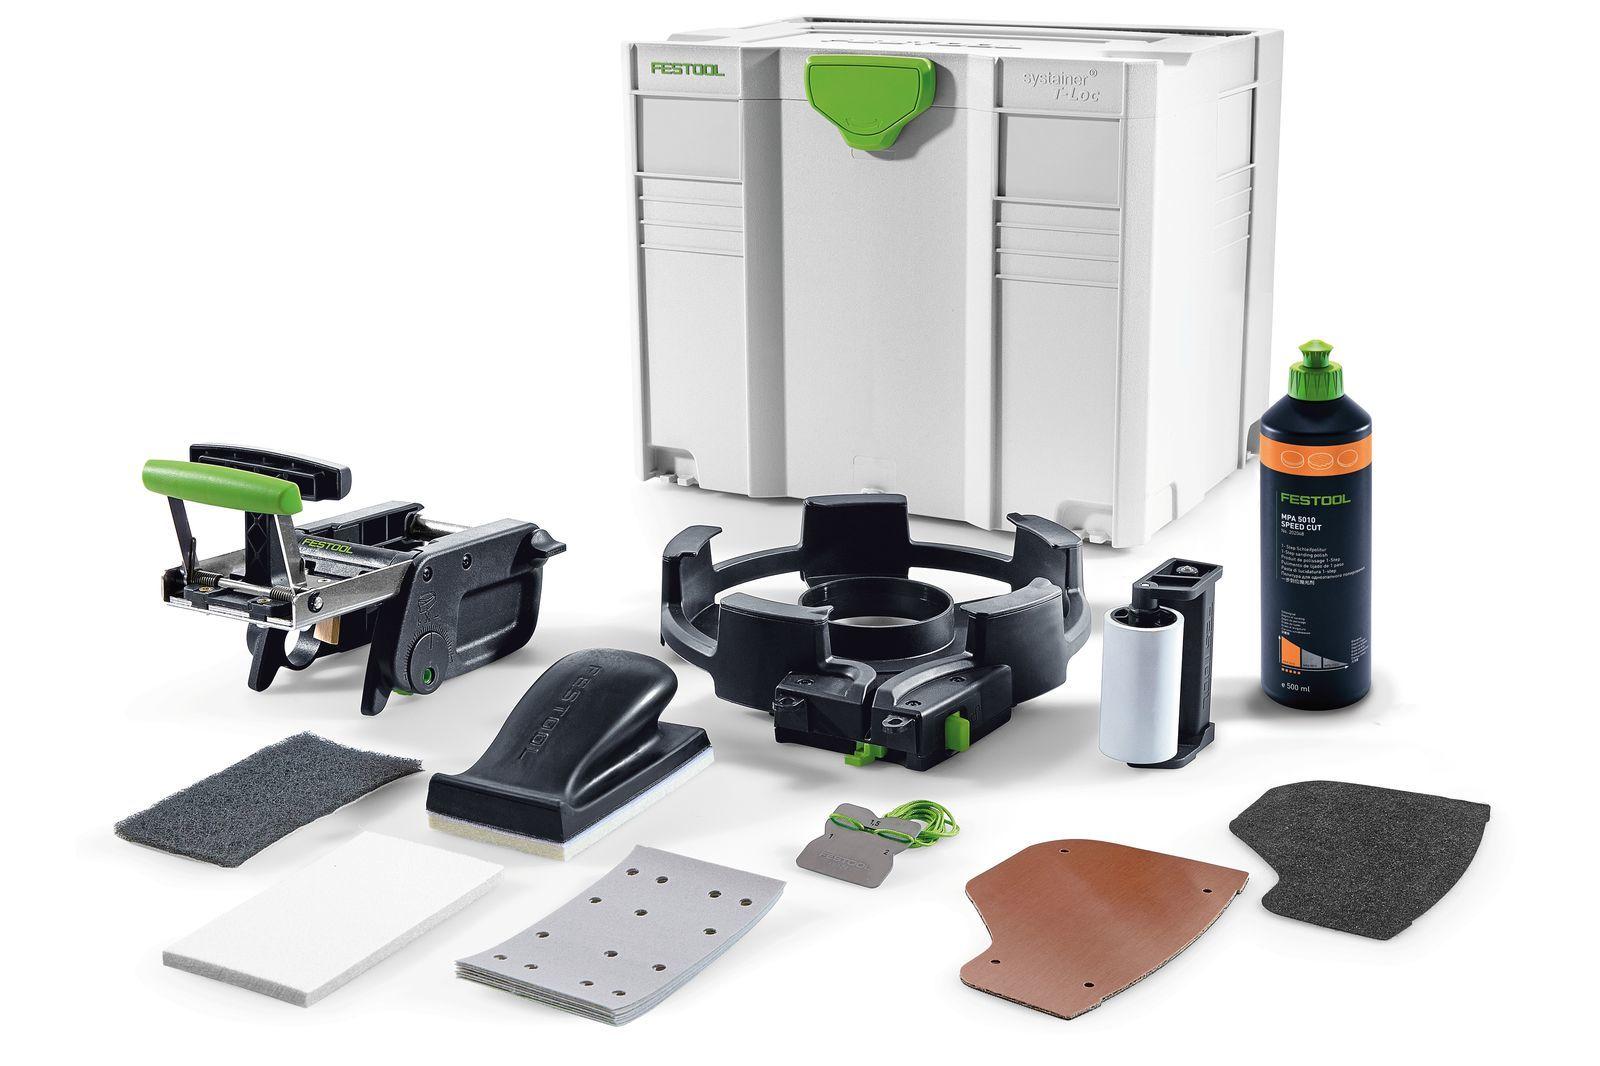 Комплект для обработки кромок, в систейнере T-Loc KB-KA 65 SYS Festool 500177